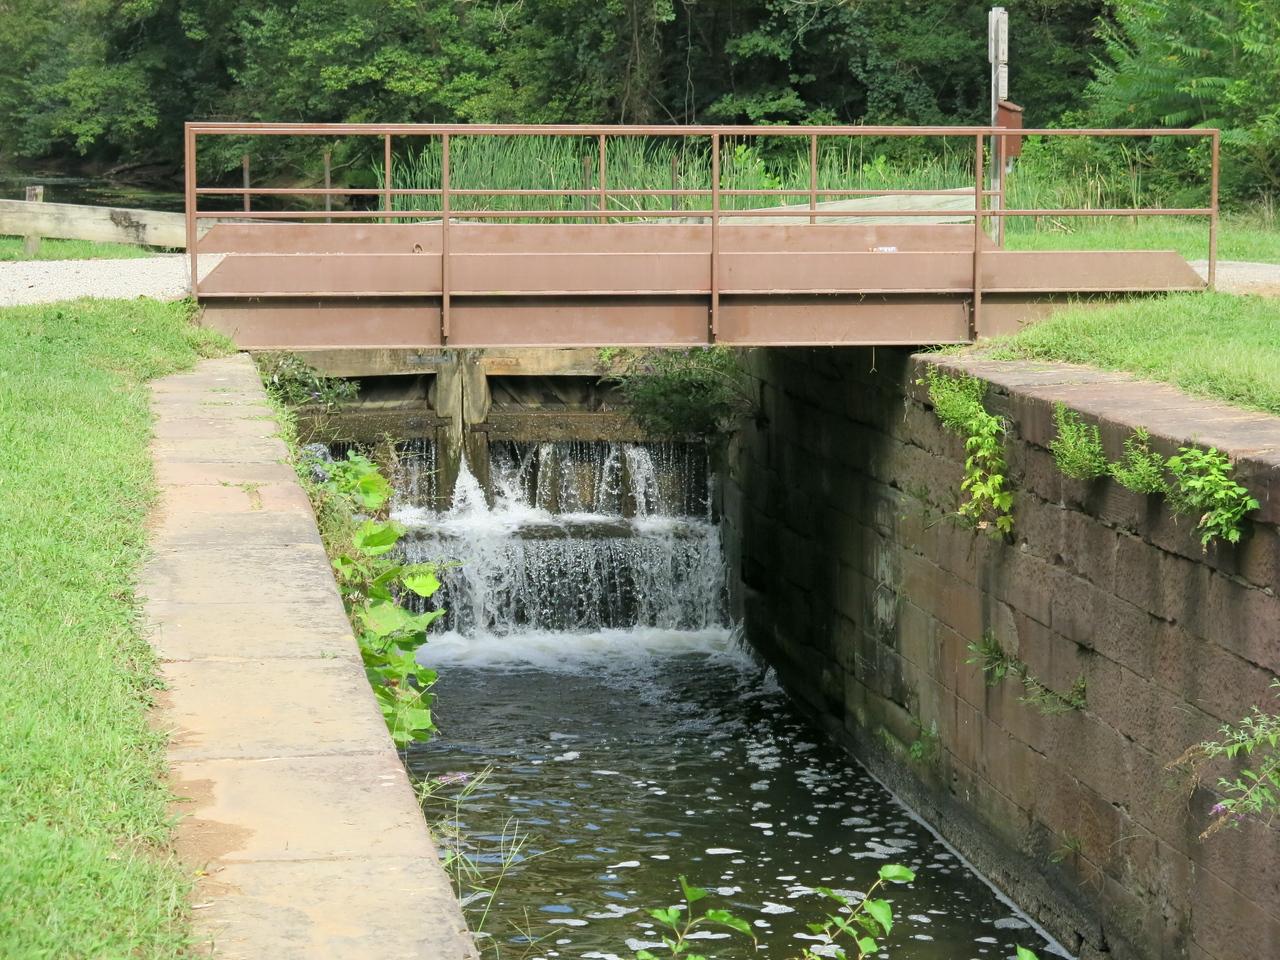 The upstream gate and bridge over Lock 21